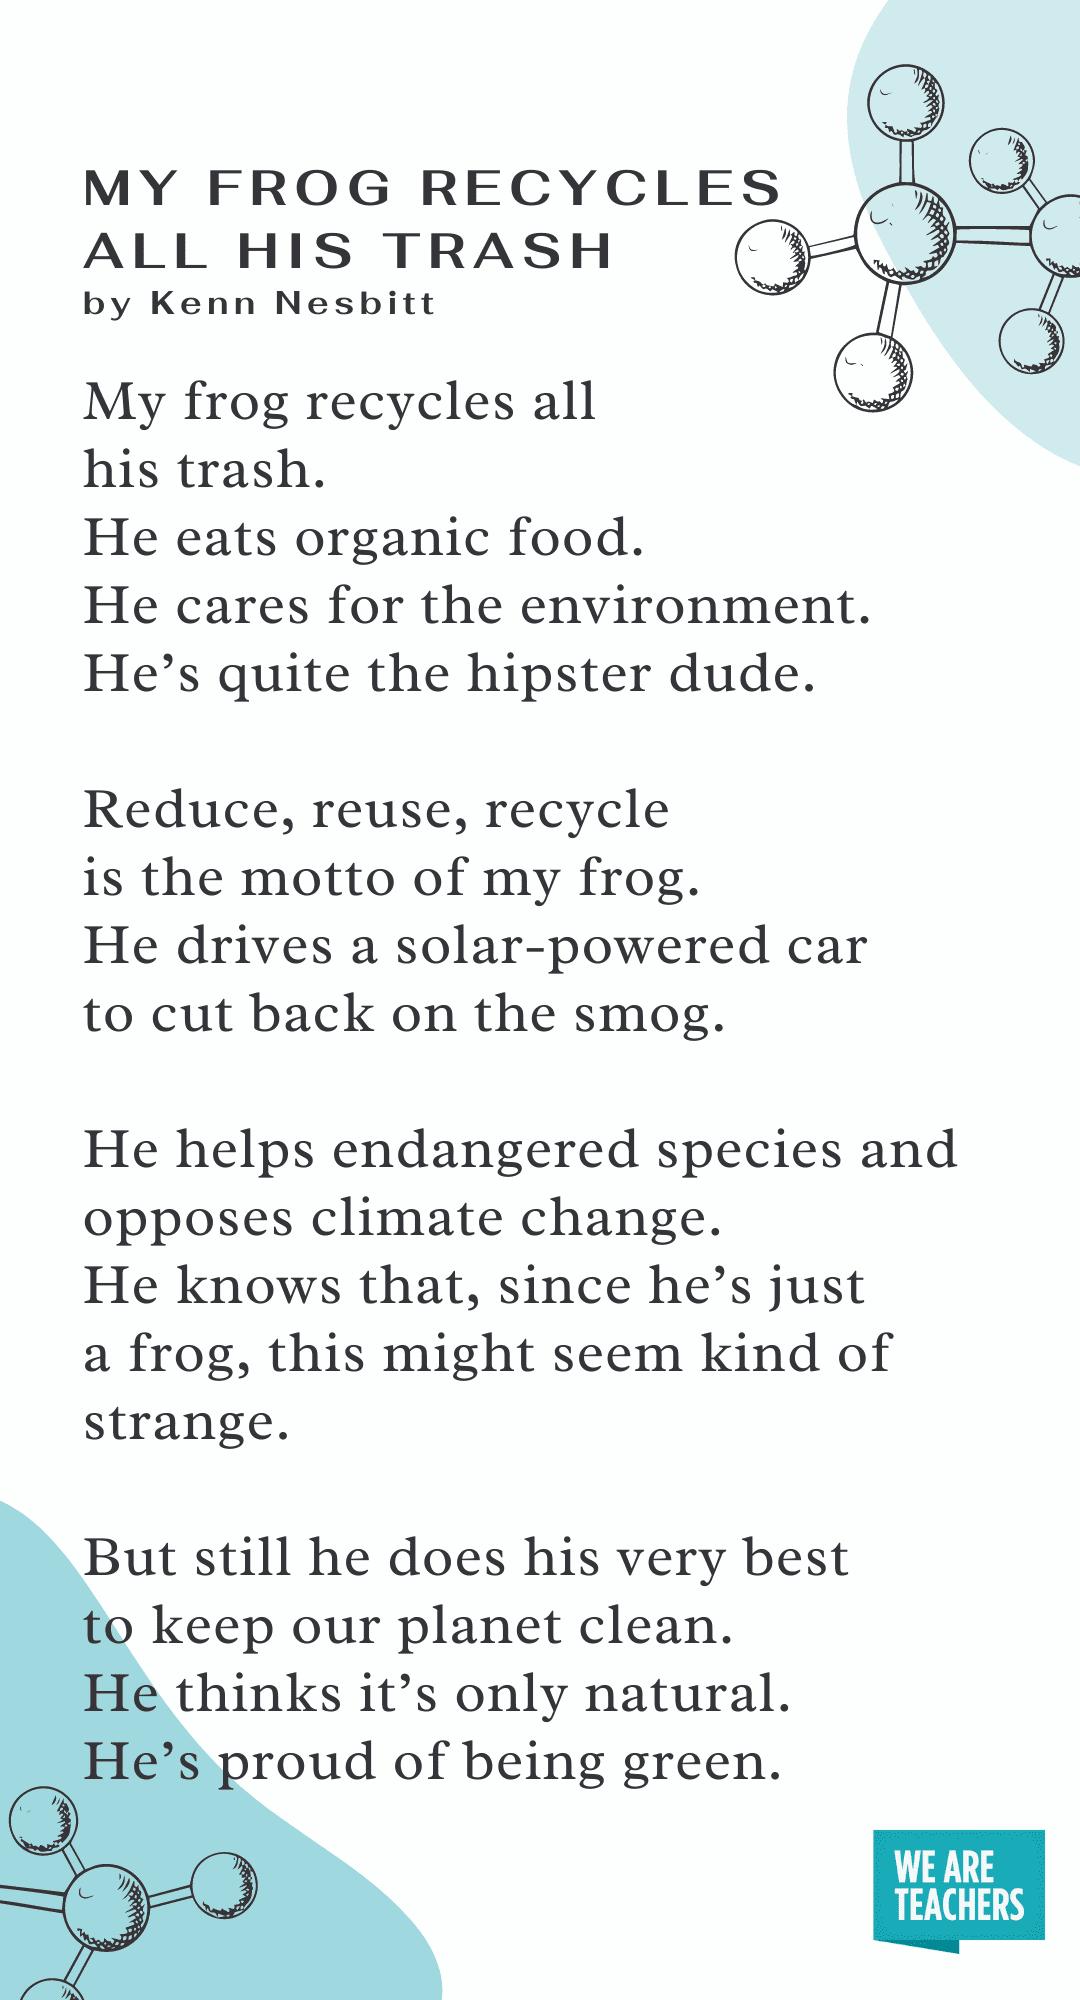 My Frog Recycles All His Trash by Kenn Nesbitt